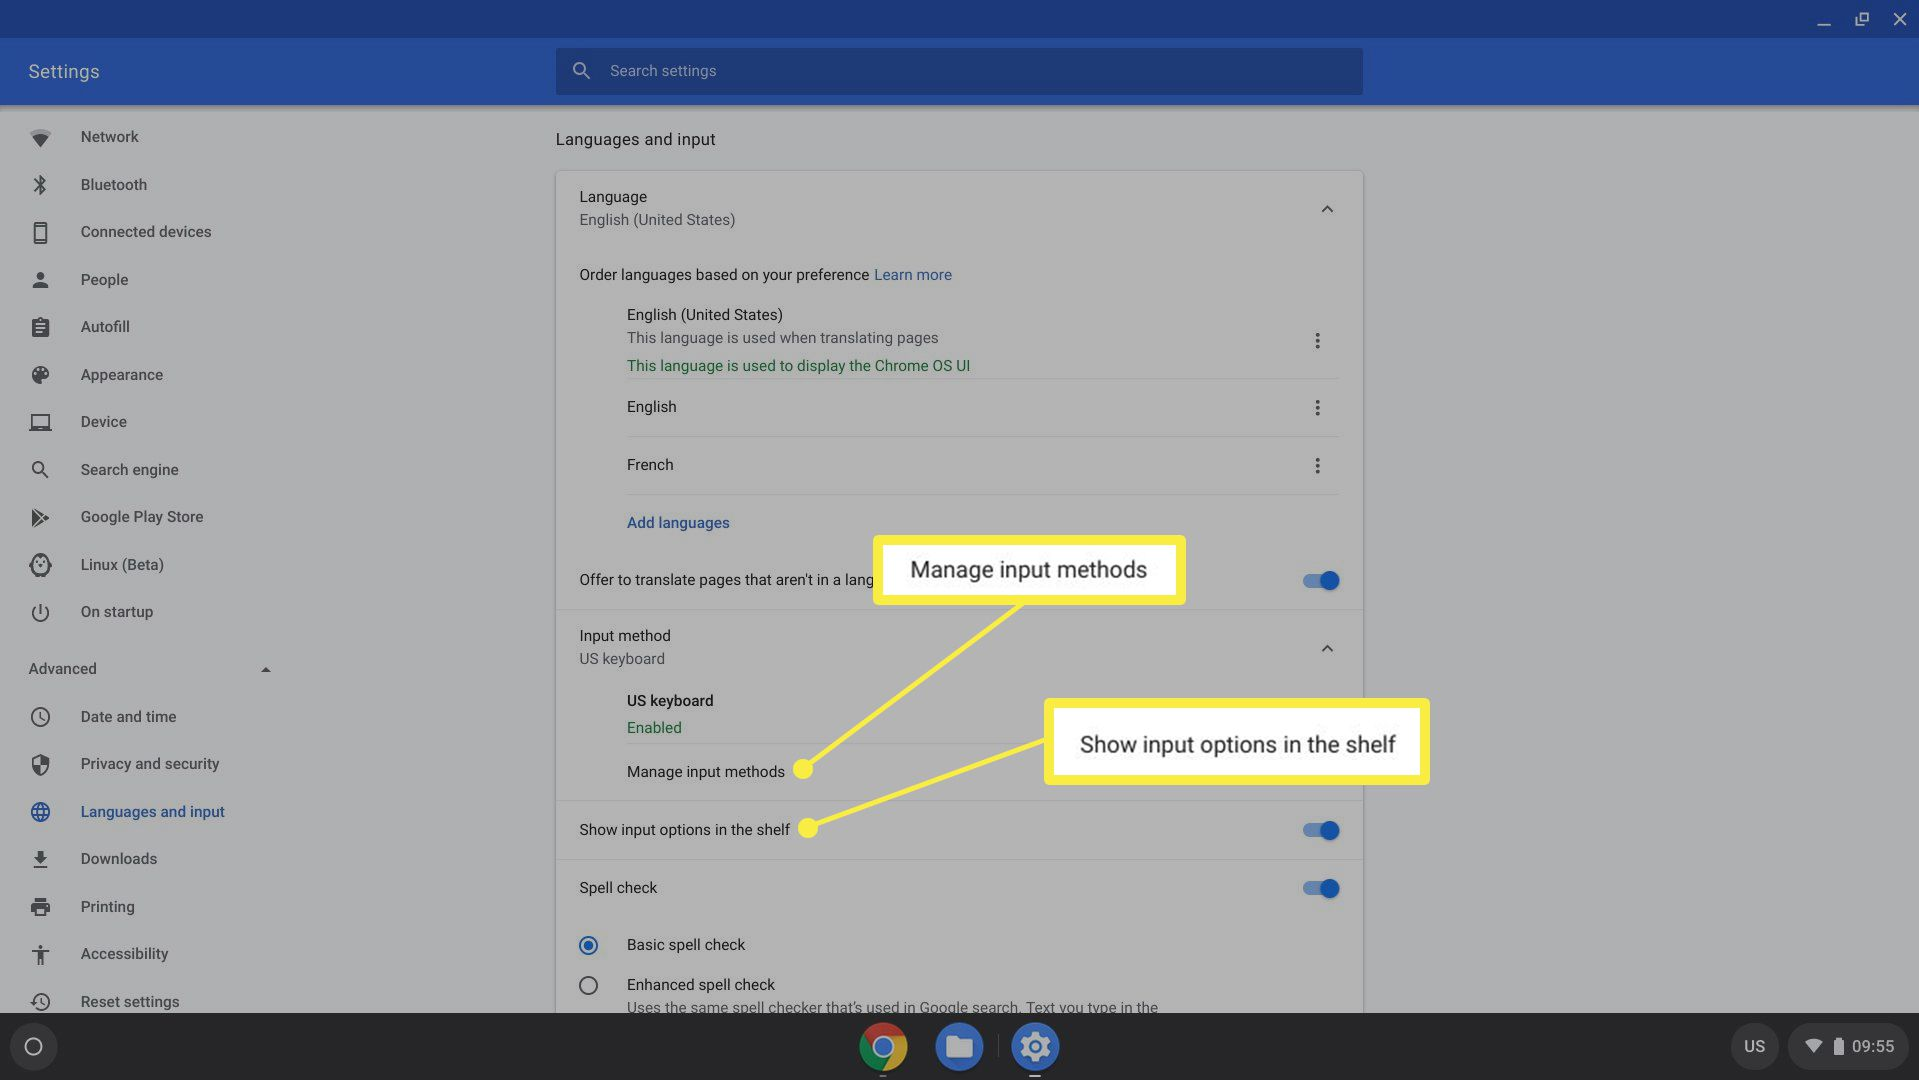 Chrome OS language and input options